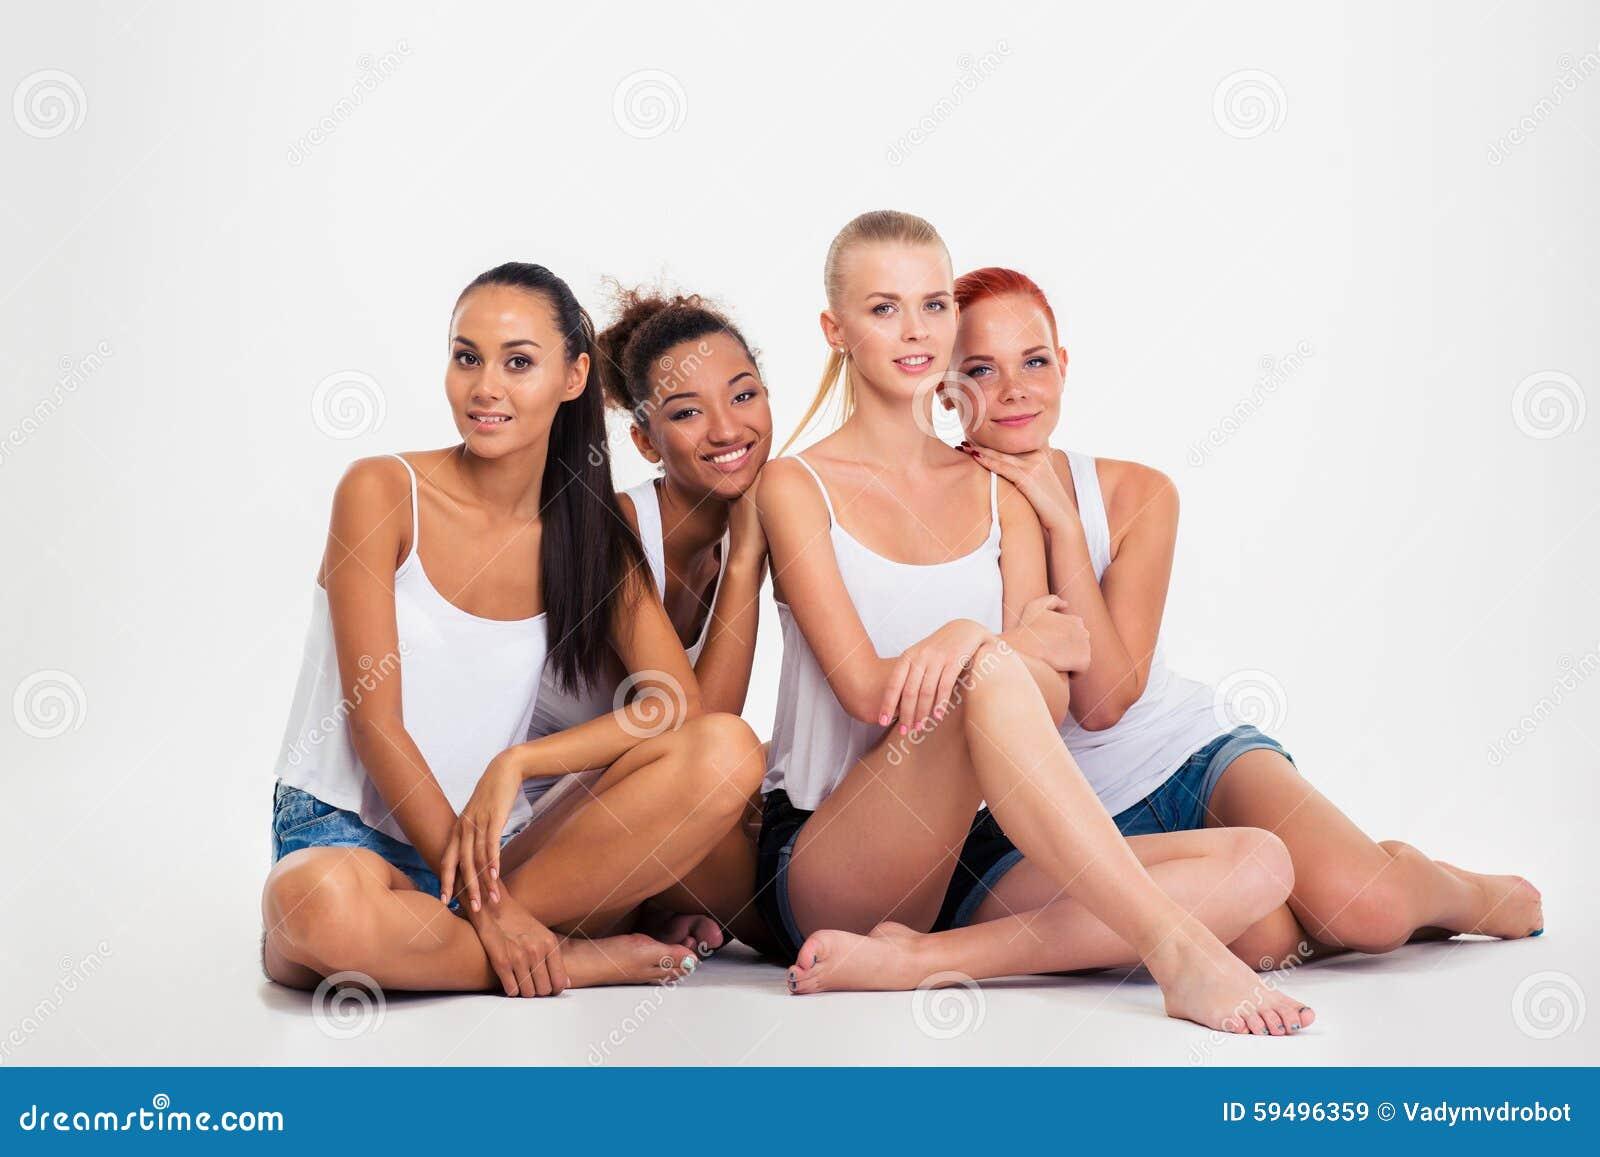 https://thumbs.dreamstime.com/z/four-women-sitting-floor-portrait-happy-multi-ethnic-isolated-white-background-59496359.jpg